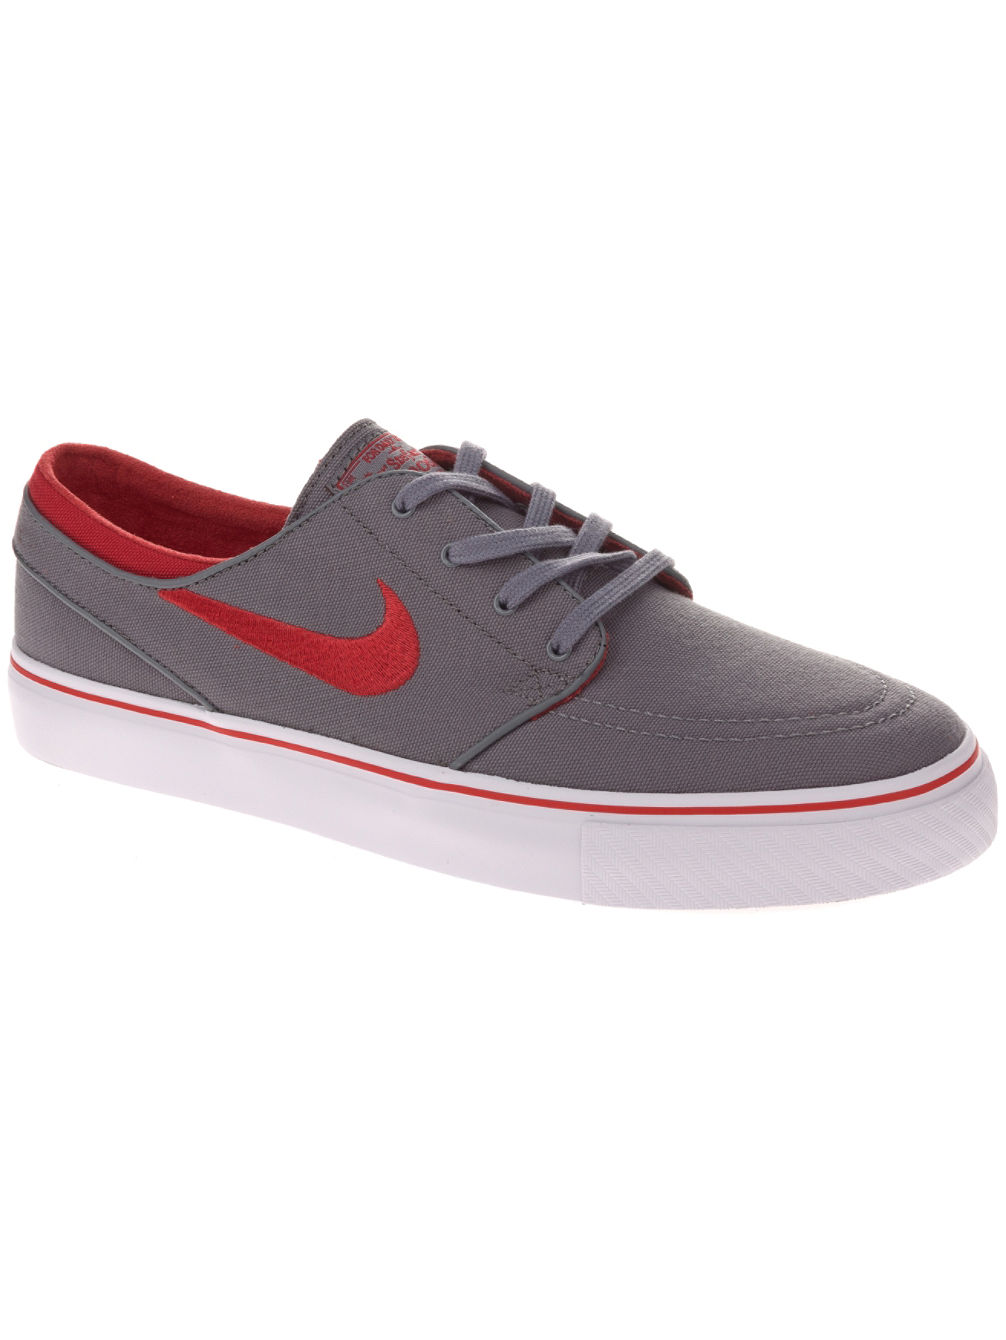 Nike Zoom Stefan Janoski Canvas Skate Shoes - nike - blue-tomato.com